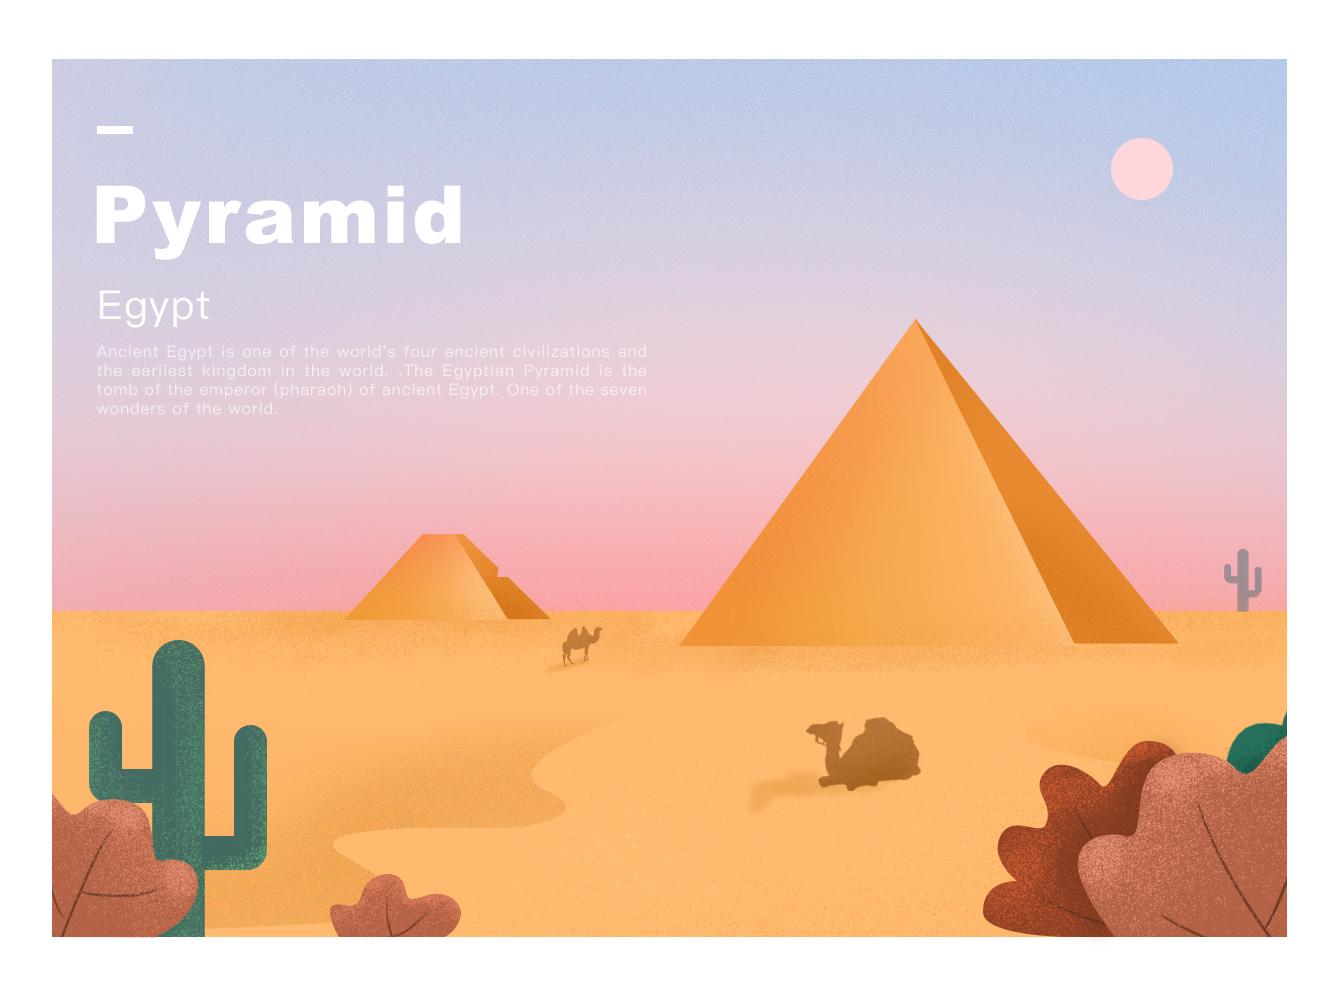 Pyramid landscape color pyramid illustration